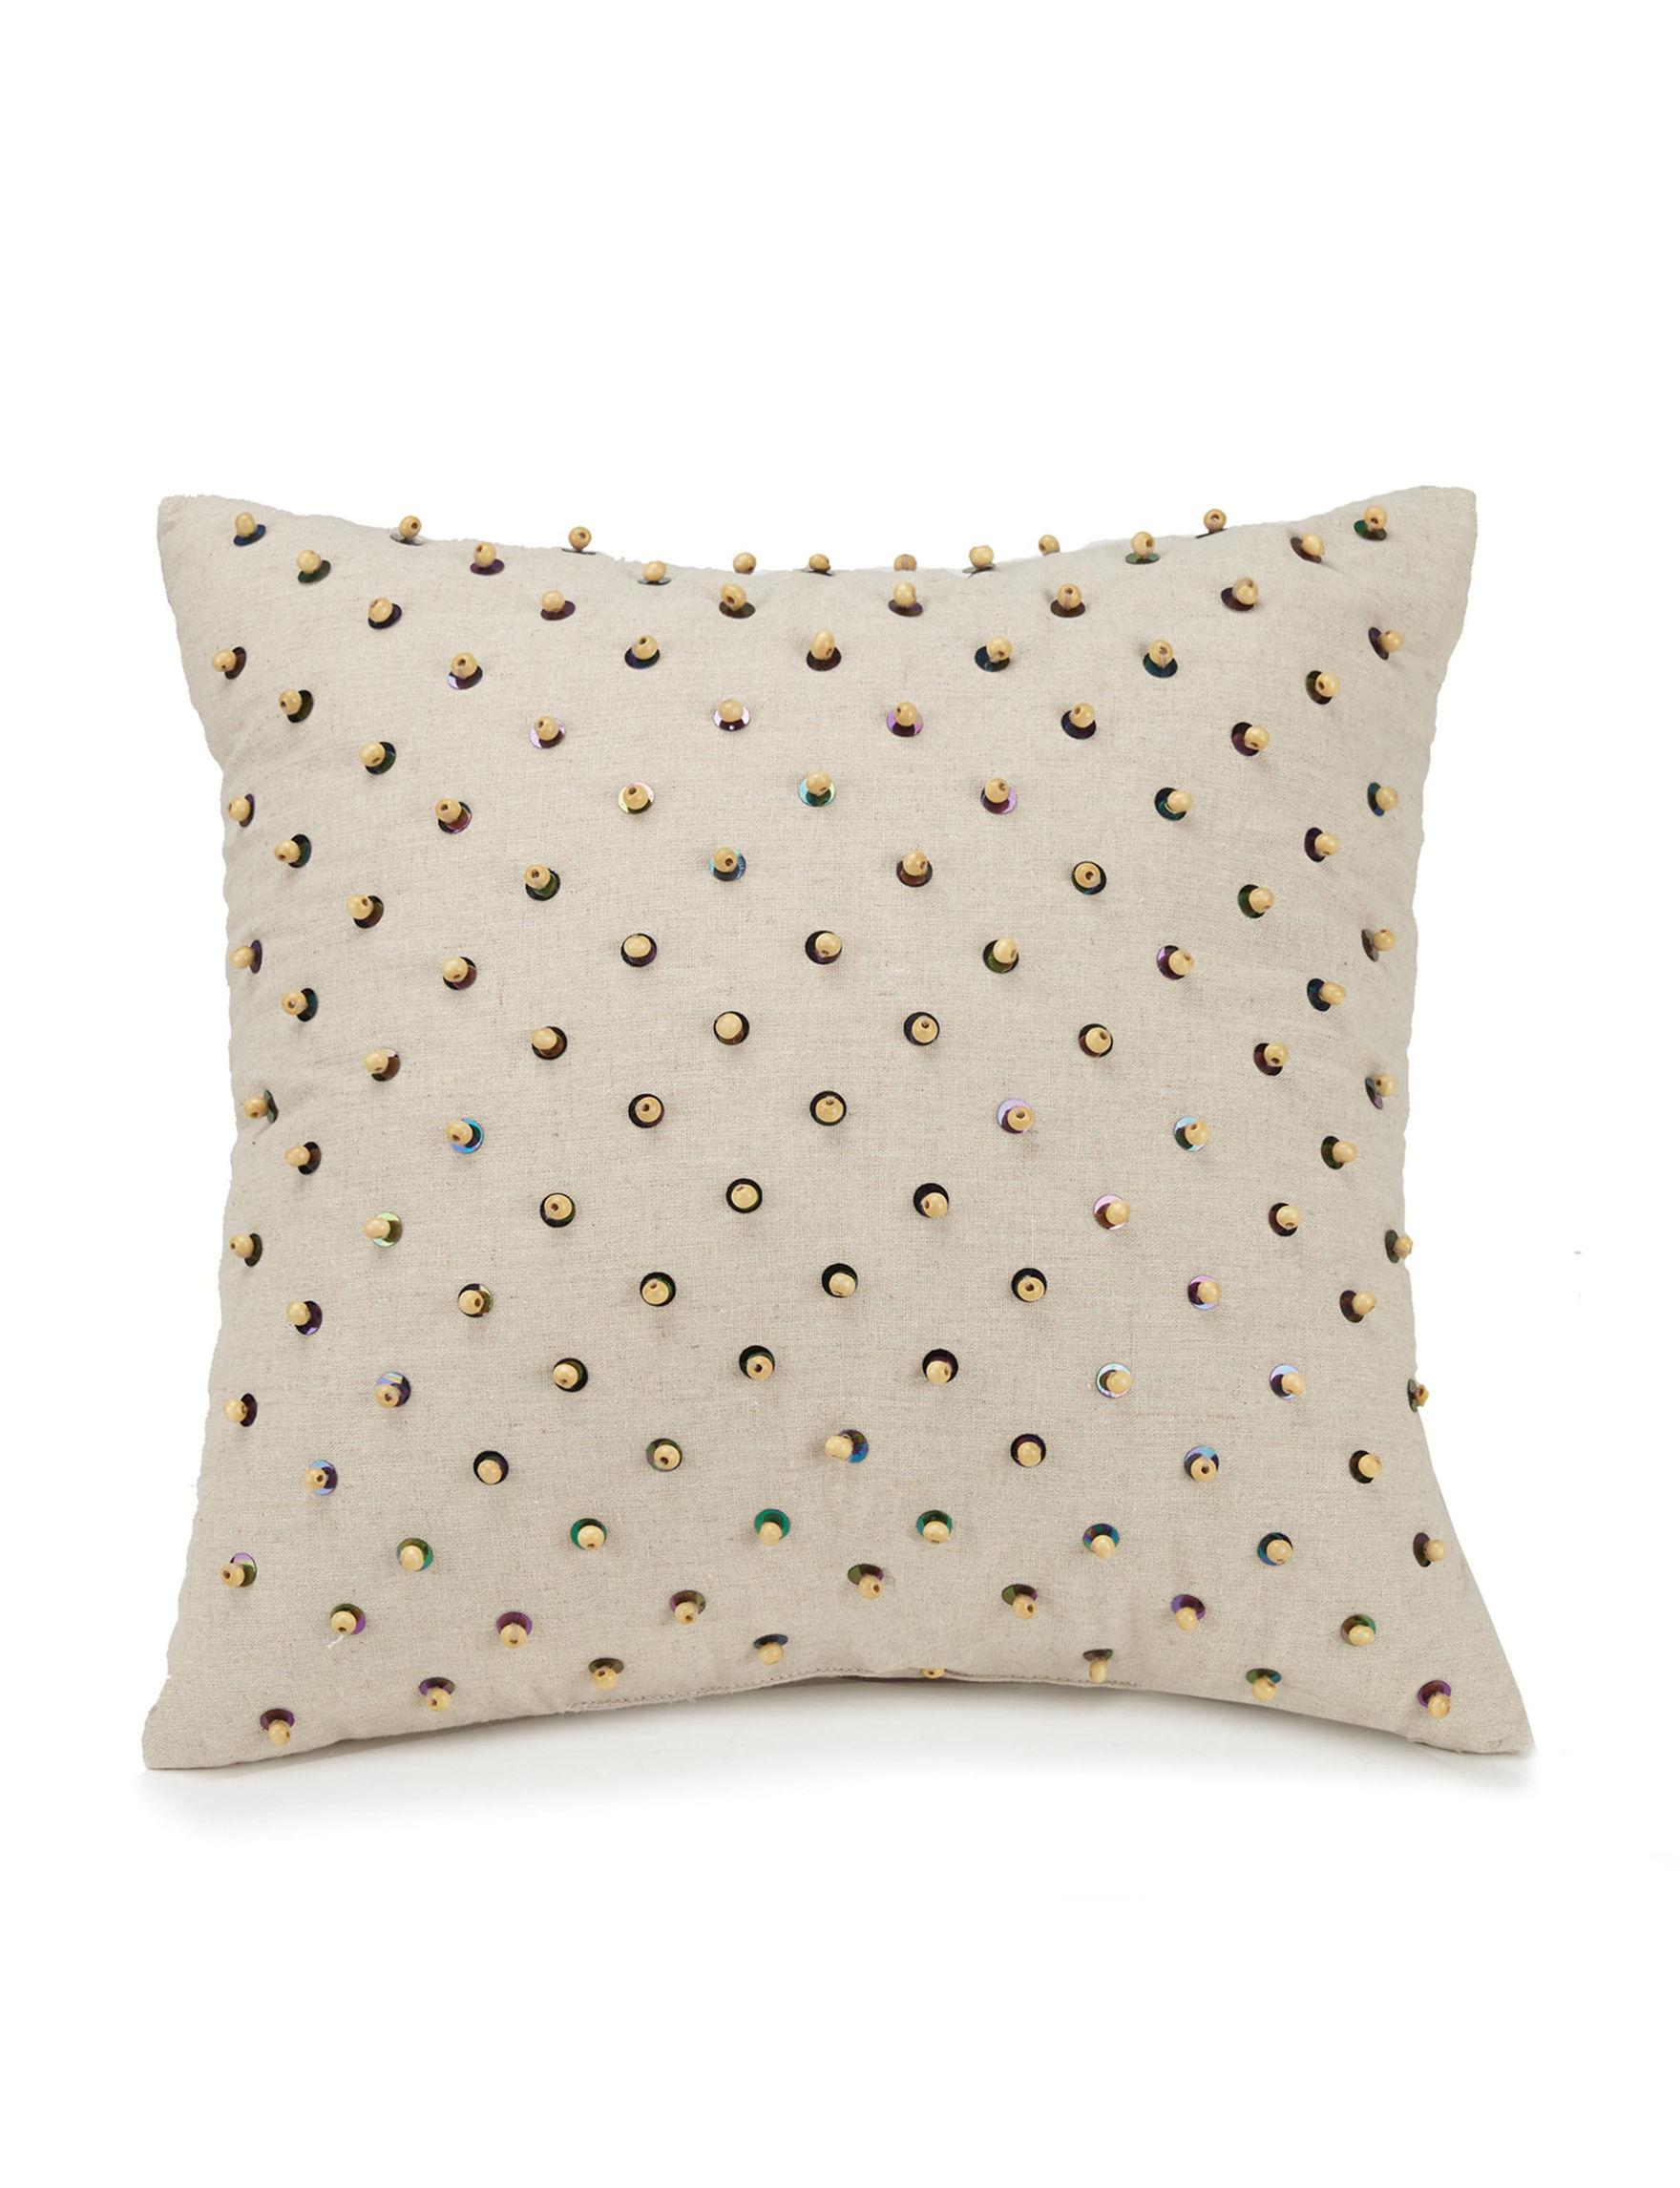 Jessica Simpson Beige Decorative Pillows